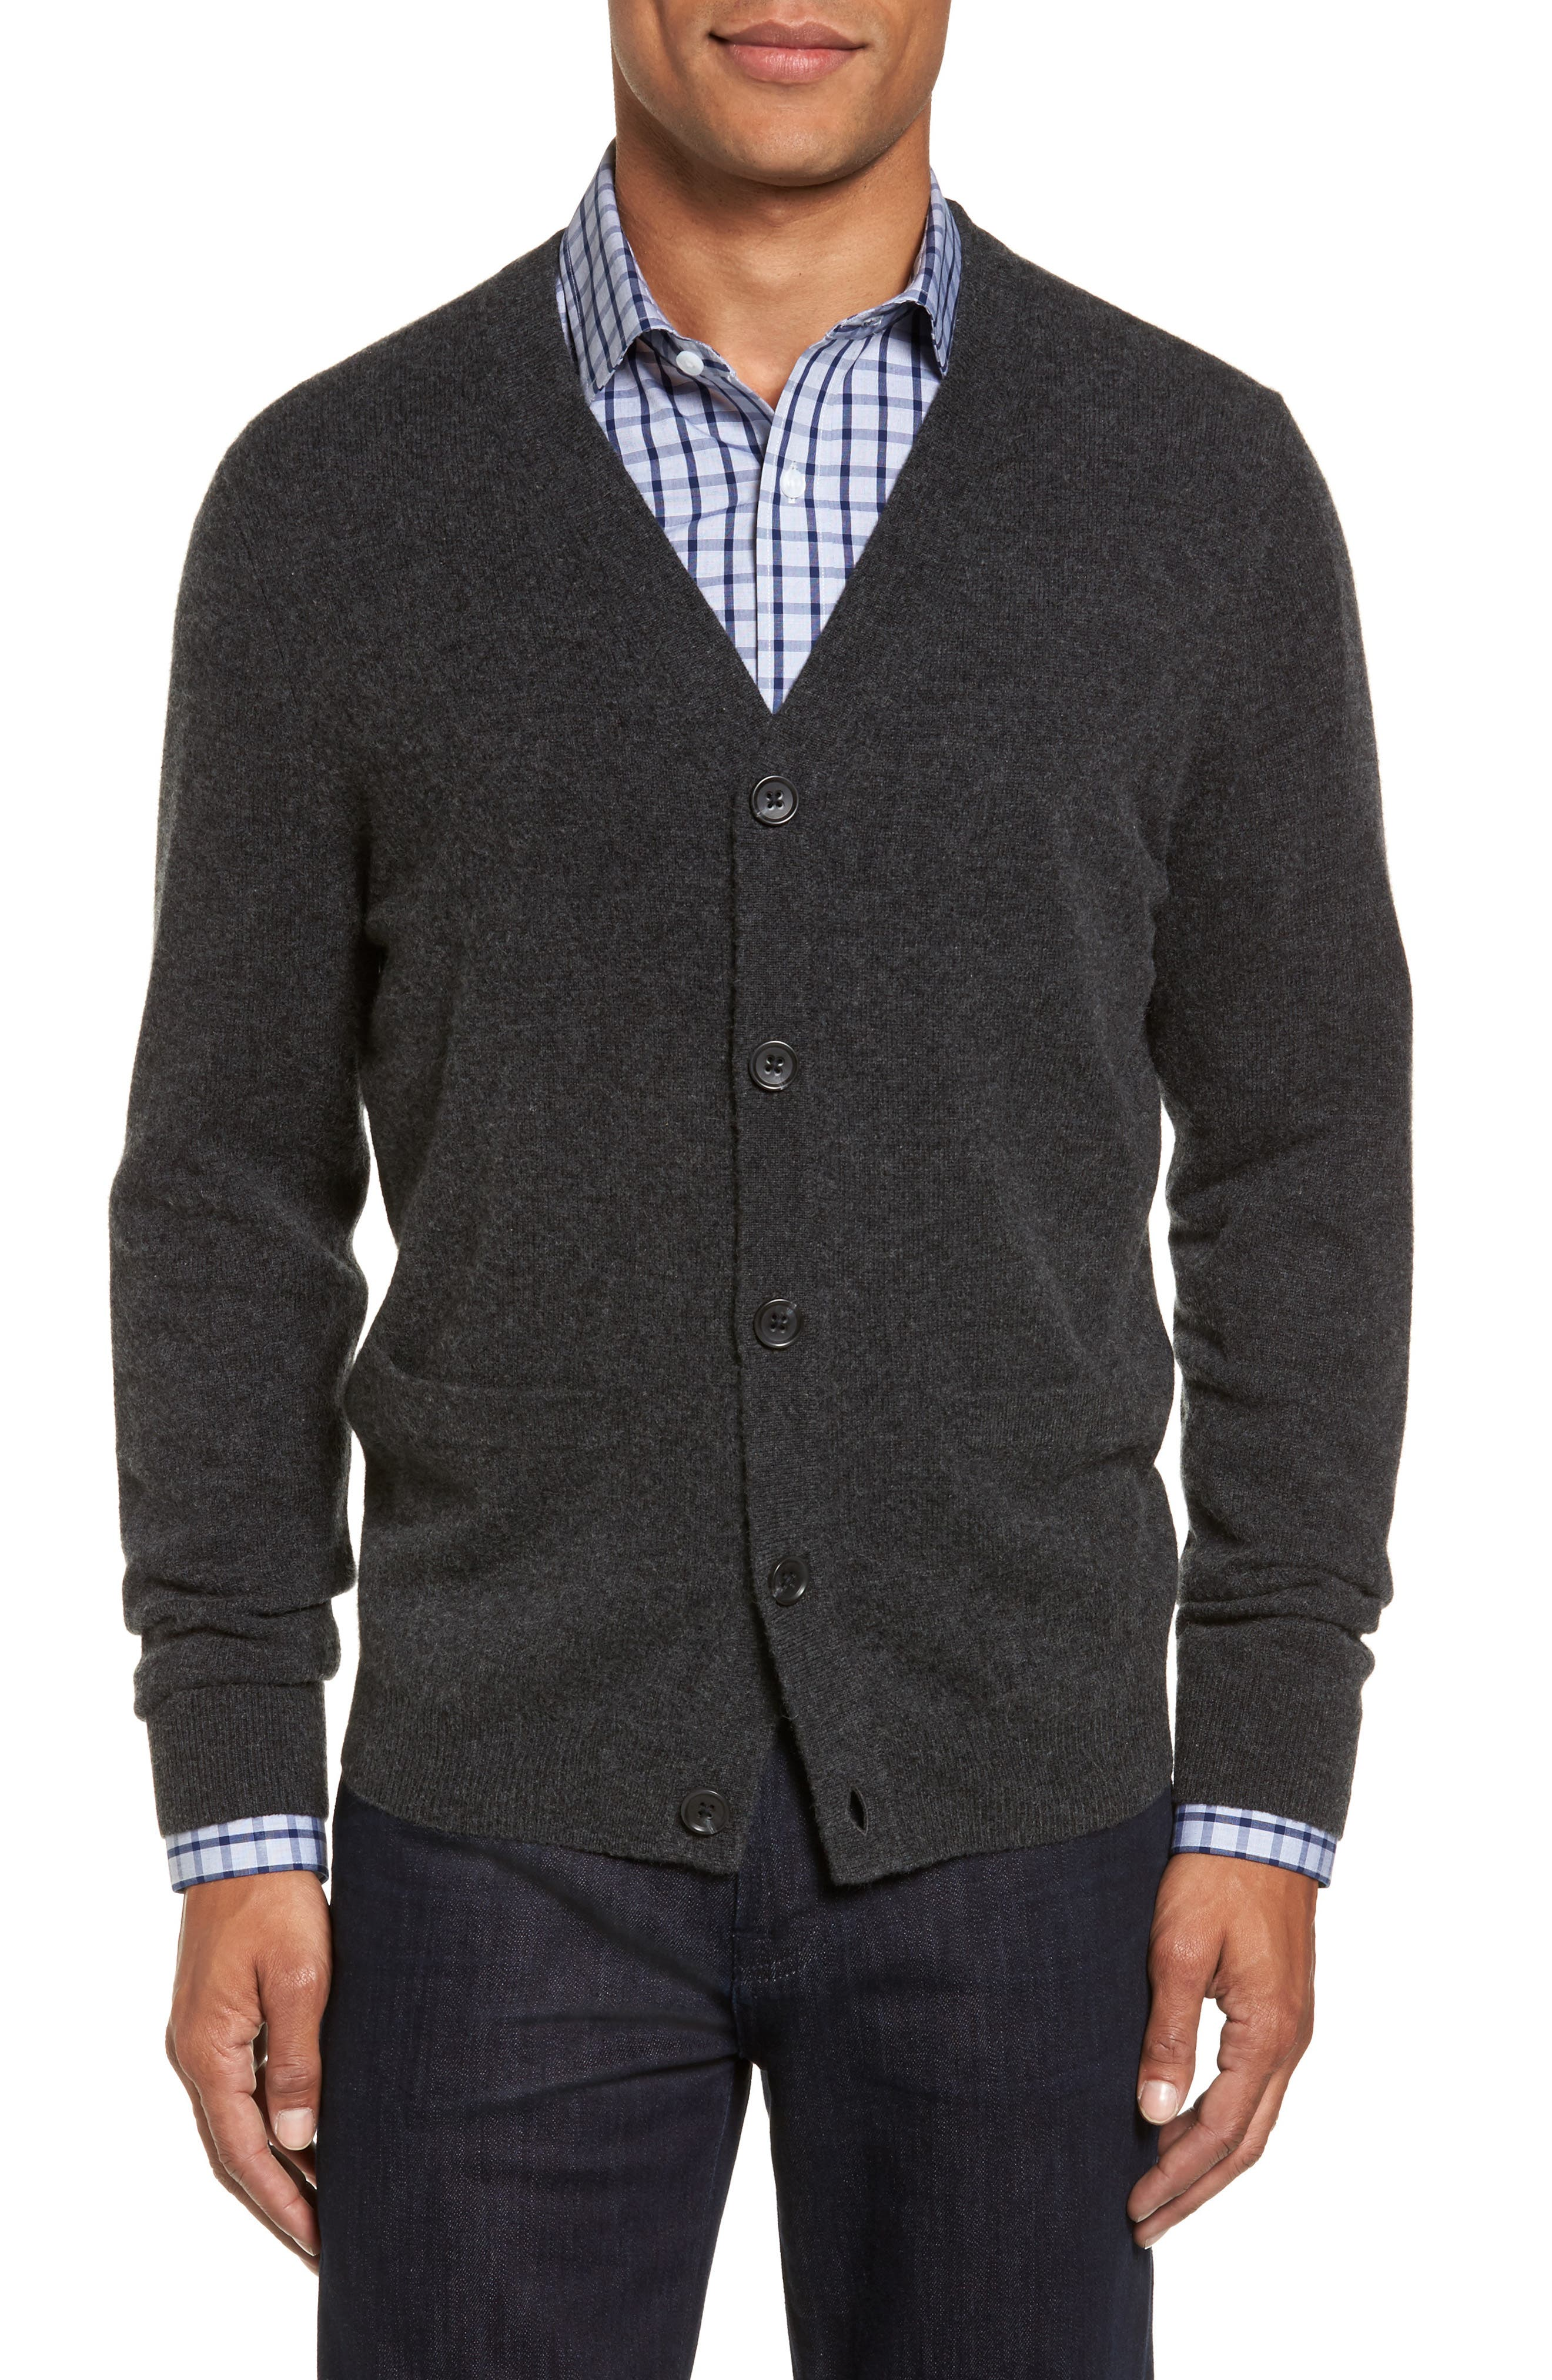 Nordstrom Shop Cashmere Button Front Cardigan, Grey